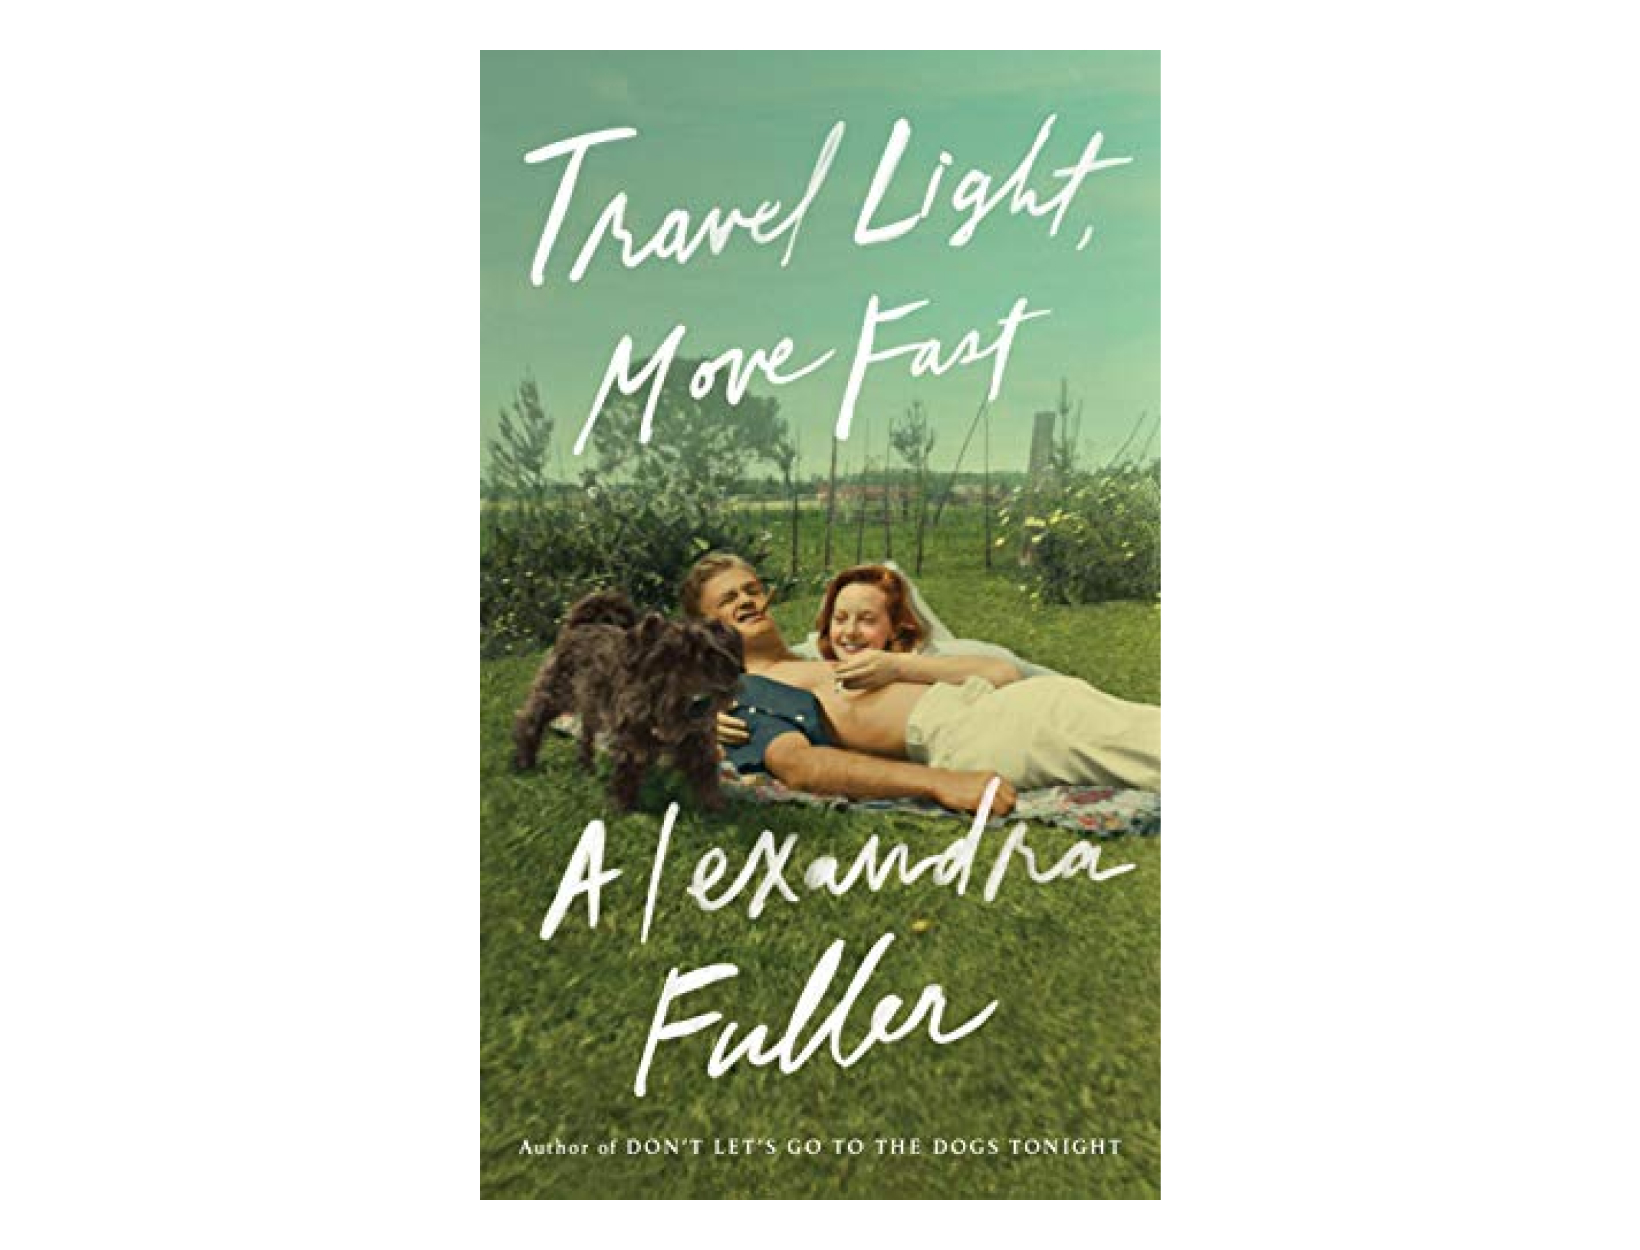 <em>Travel Light, Move Fast</em> by AlexandraFuller